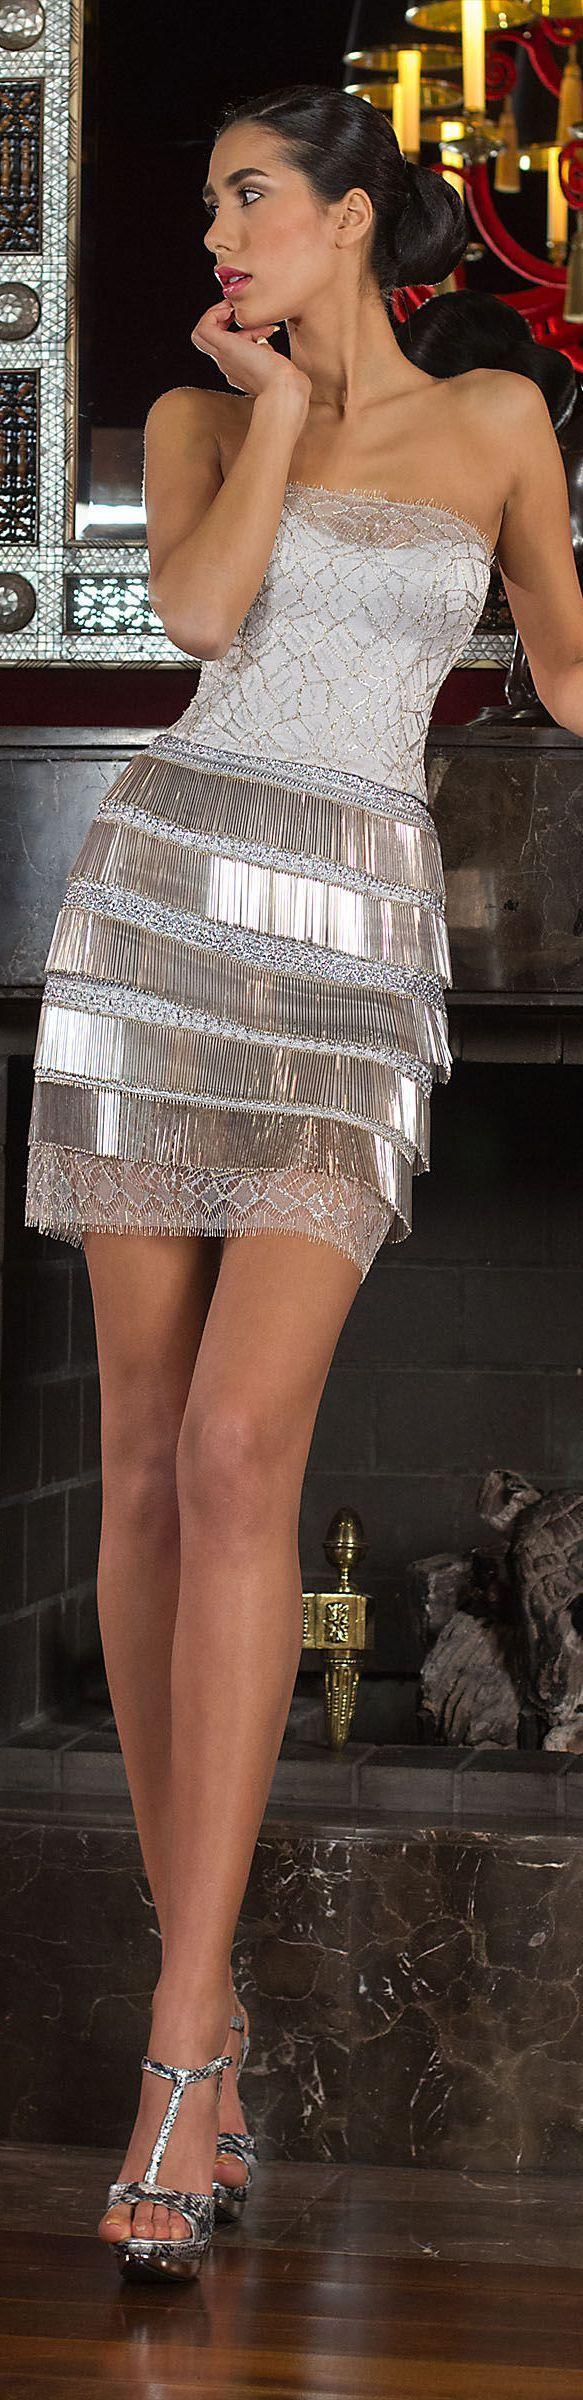 Ladyluxurydesigns chaya jolikaus coctail dresses pinterest